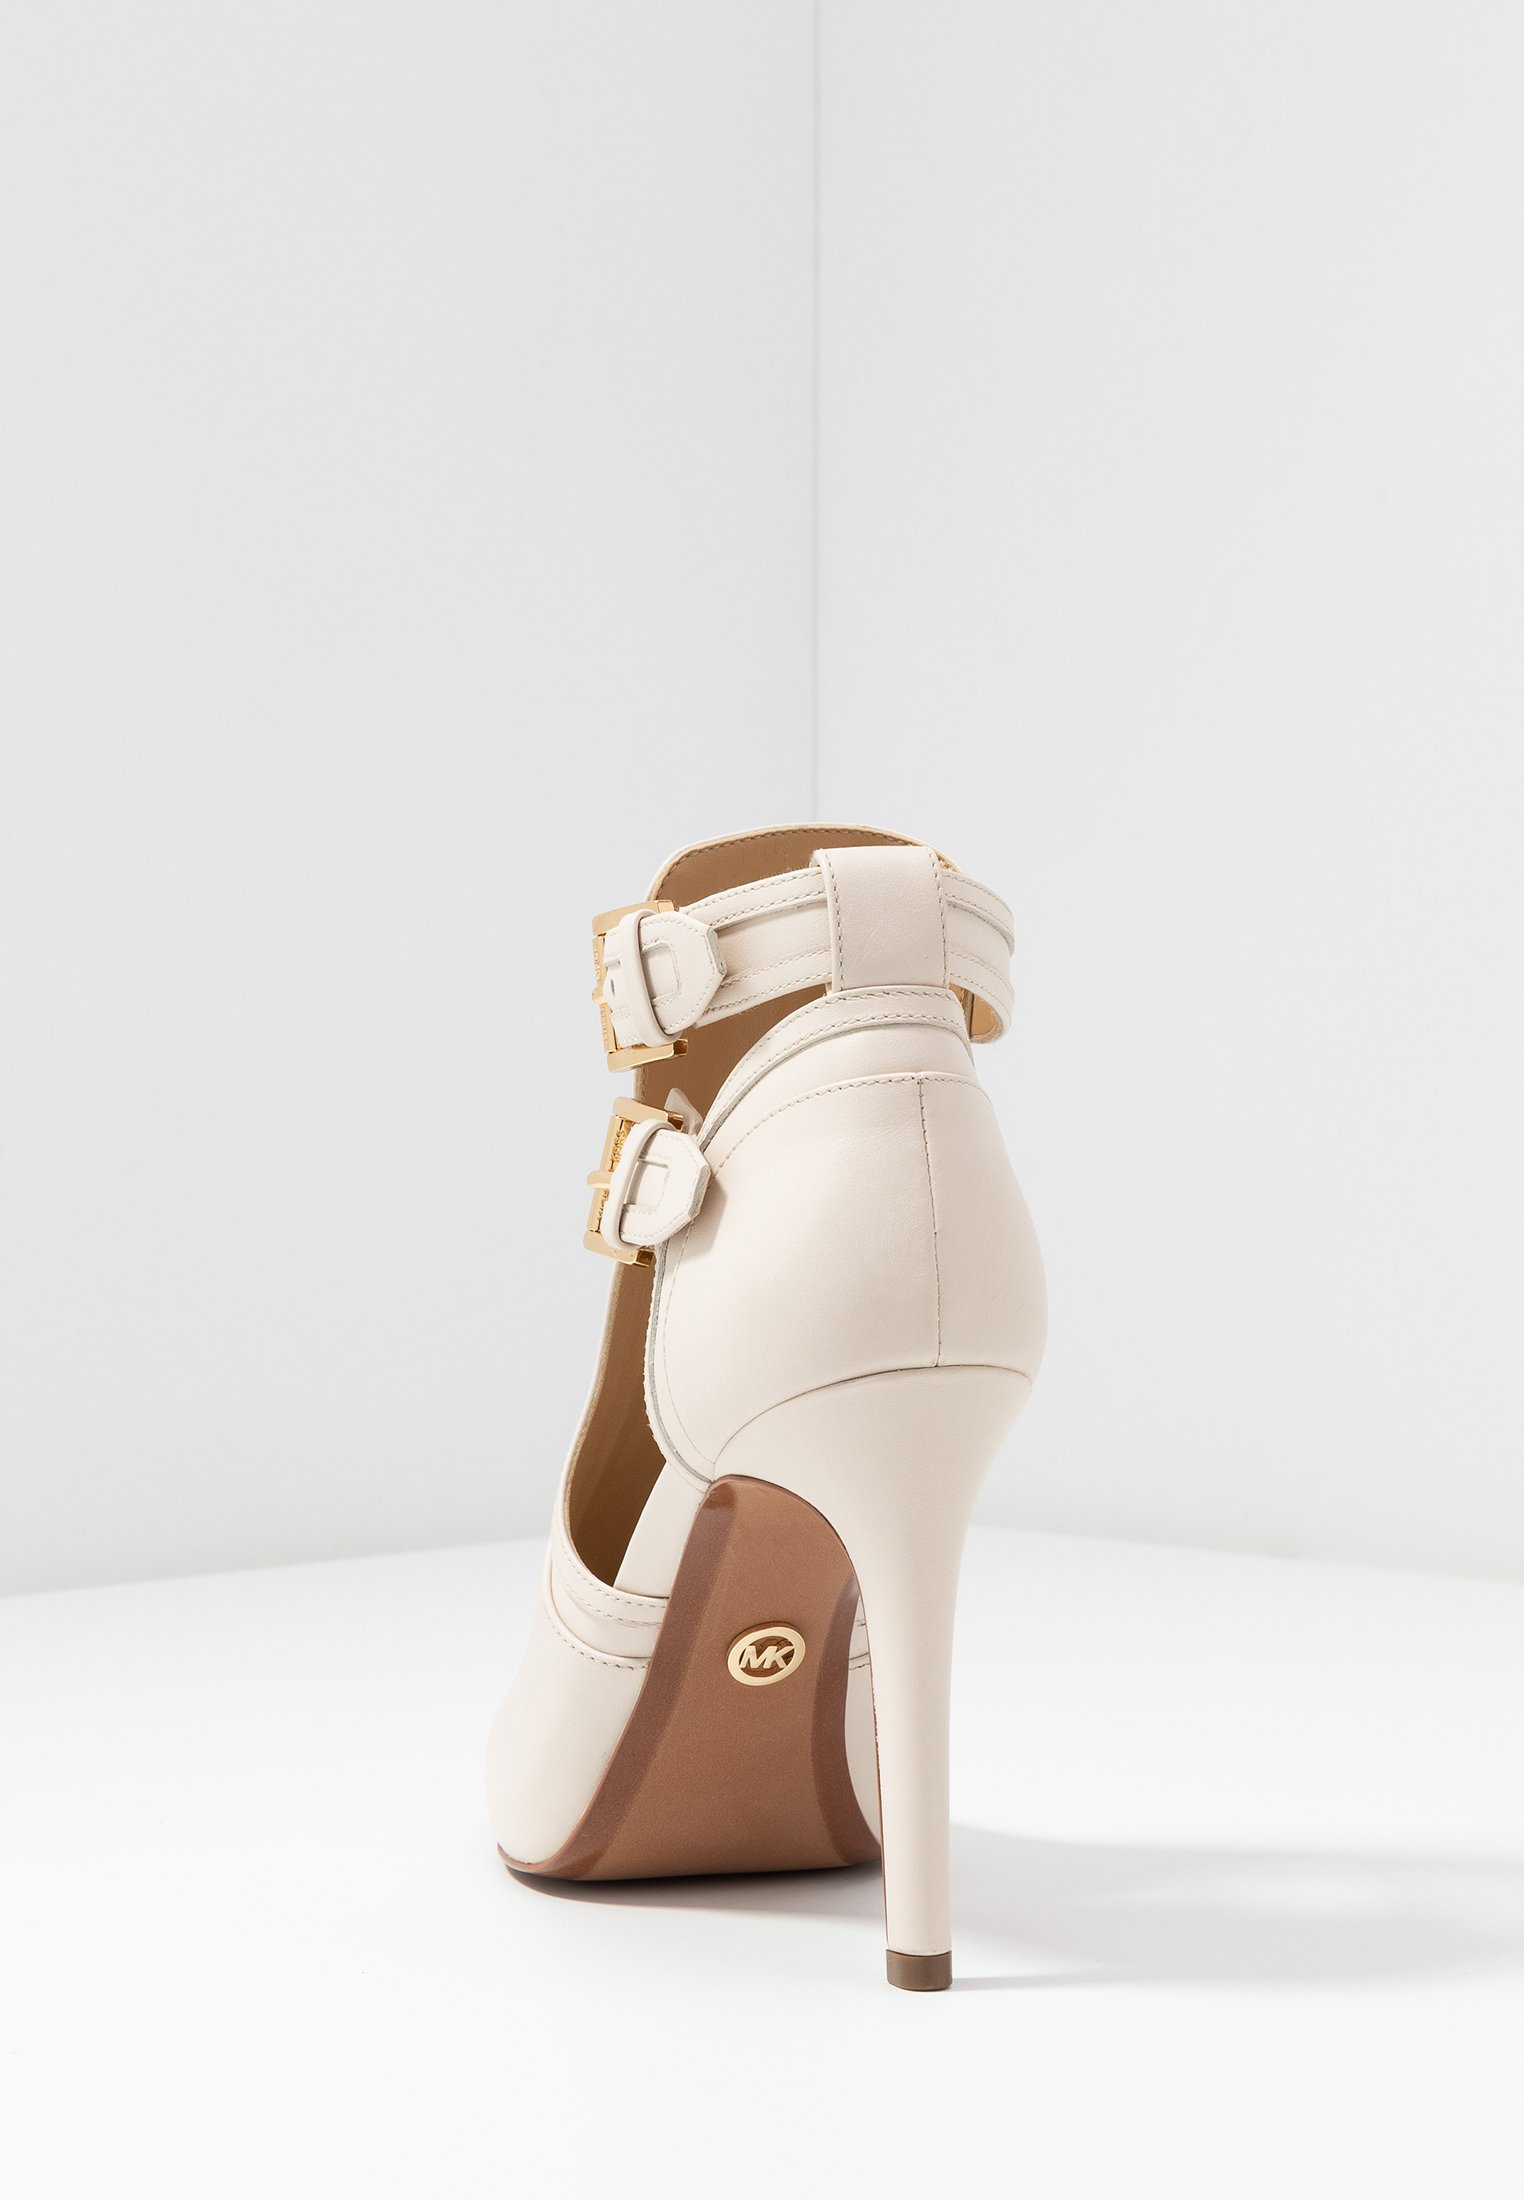 Michael Kors Blaze Open Toe Bootie - High Heeled Ankle Boots Light Cream